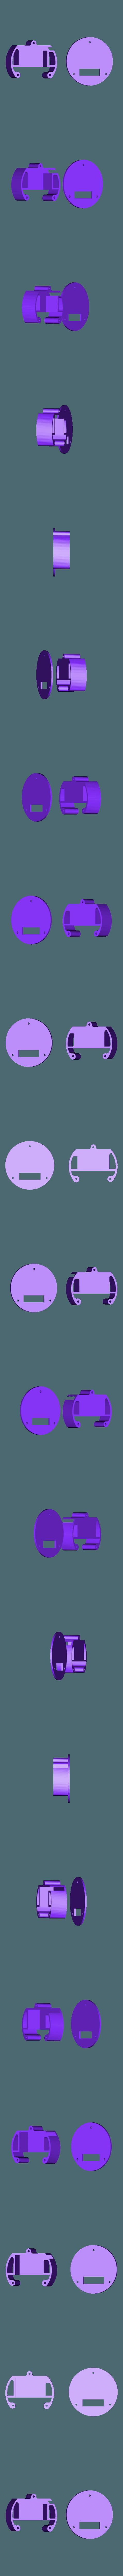 SUPPORT SERVO GAUCHE.stl Download free STL file SERVO SUPPORT LEFT • 3D print object, charlescotte